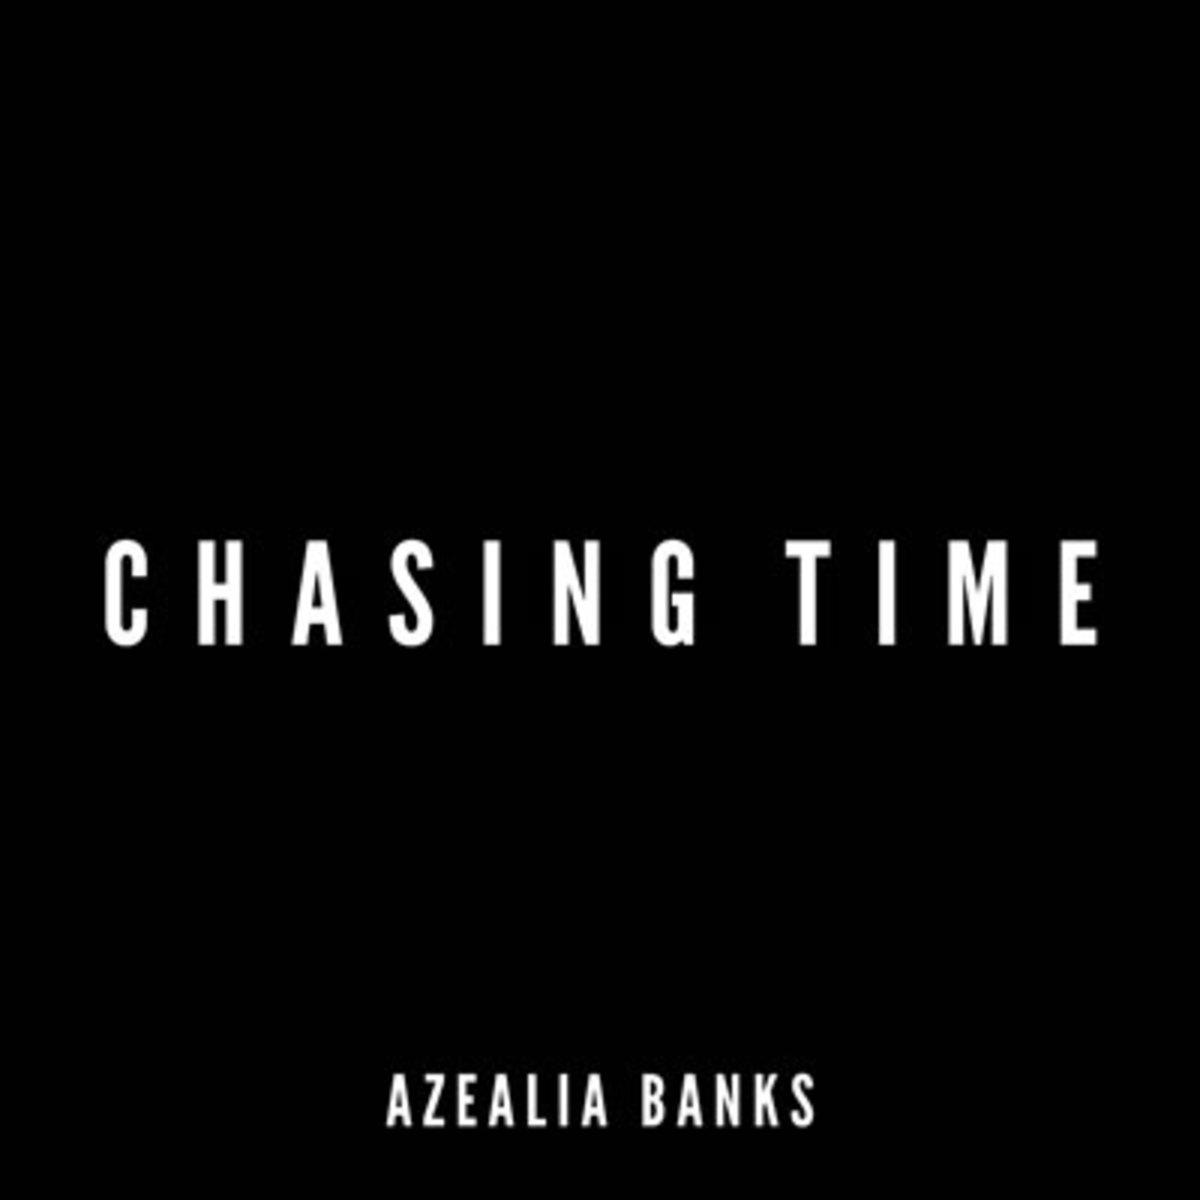 azealiabanks-chasingtime.jpg